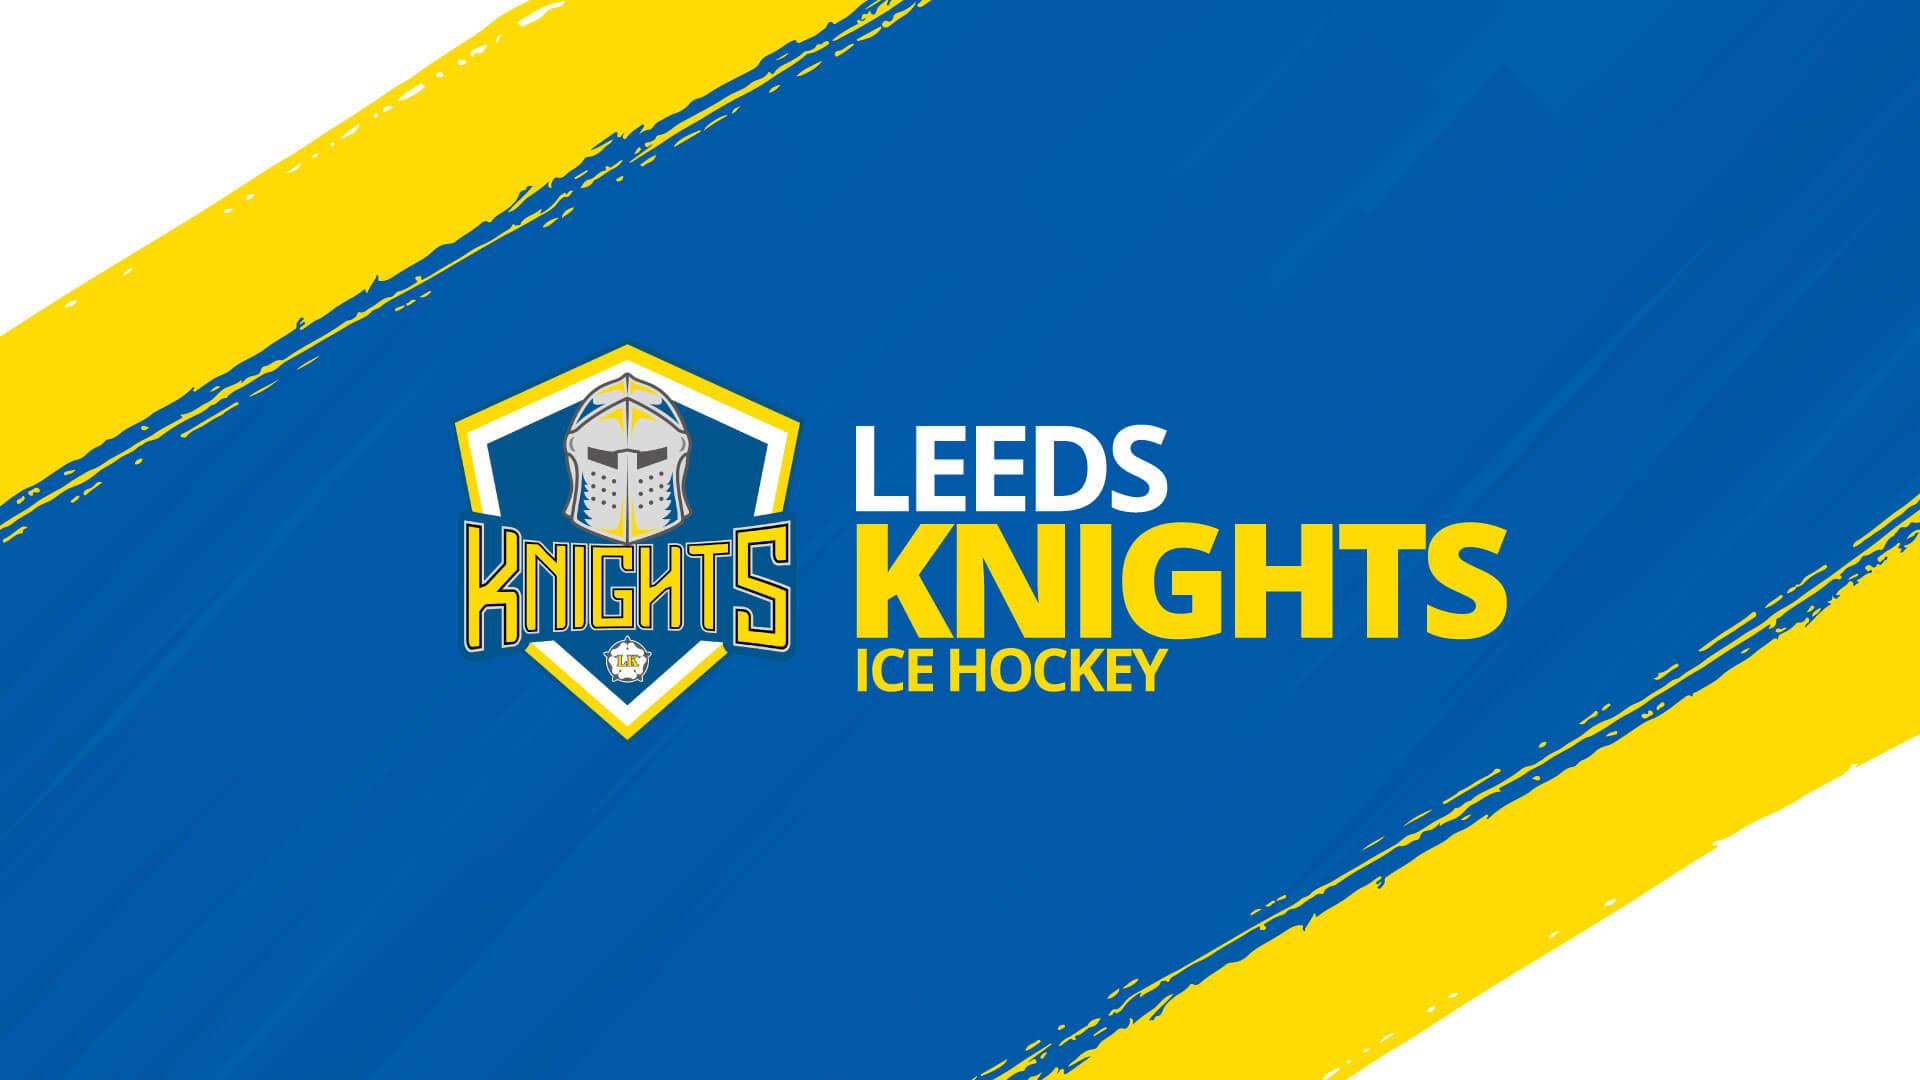 Leeds Knights Ice Hockey